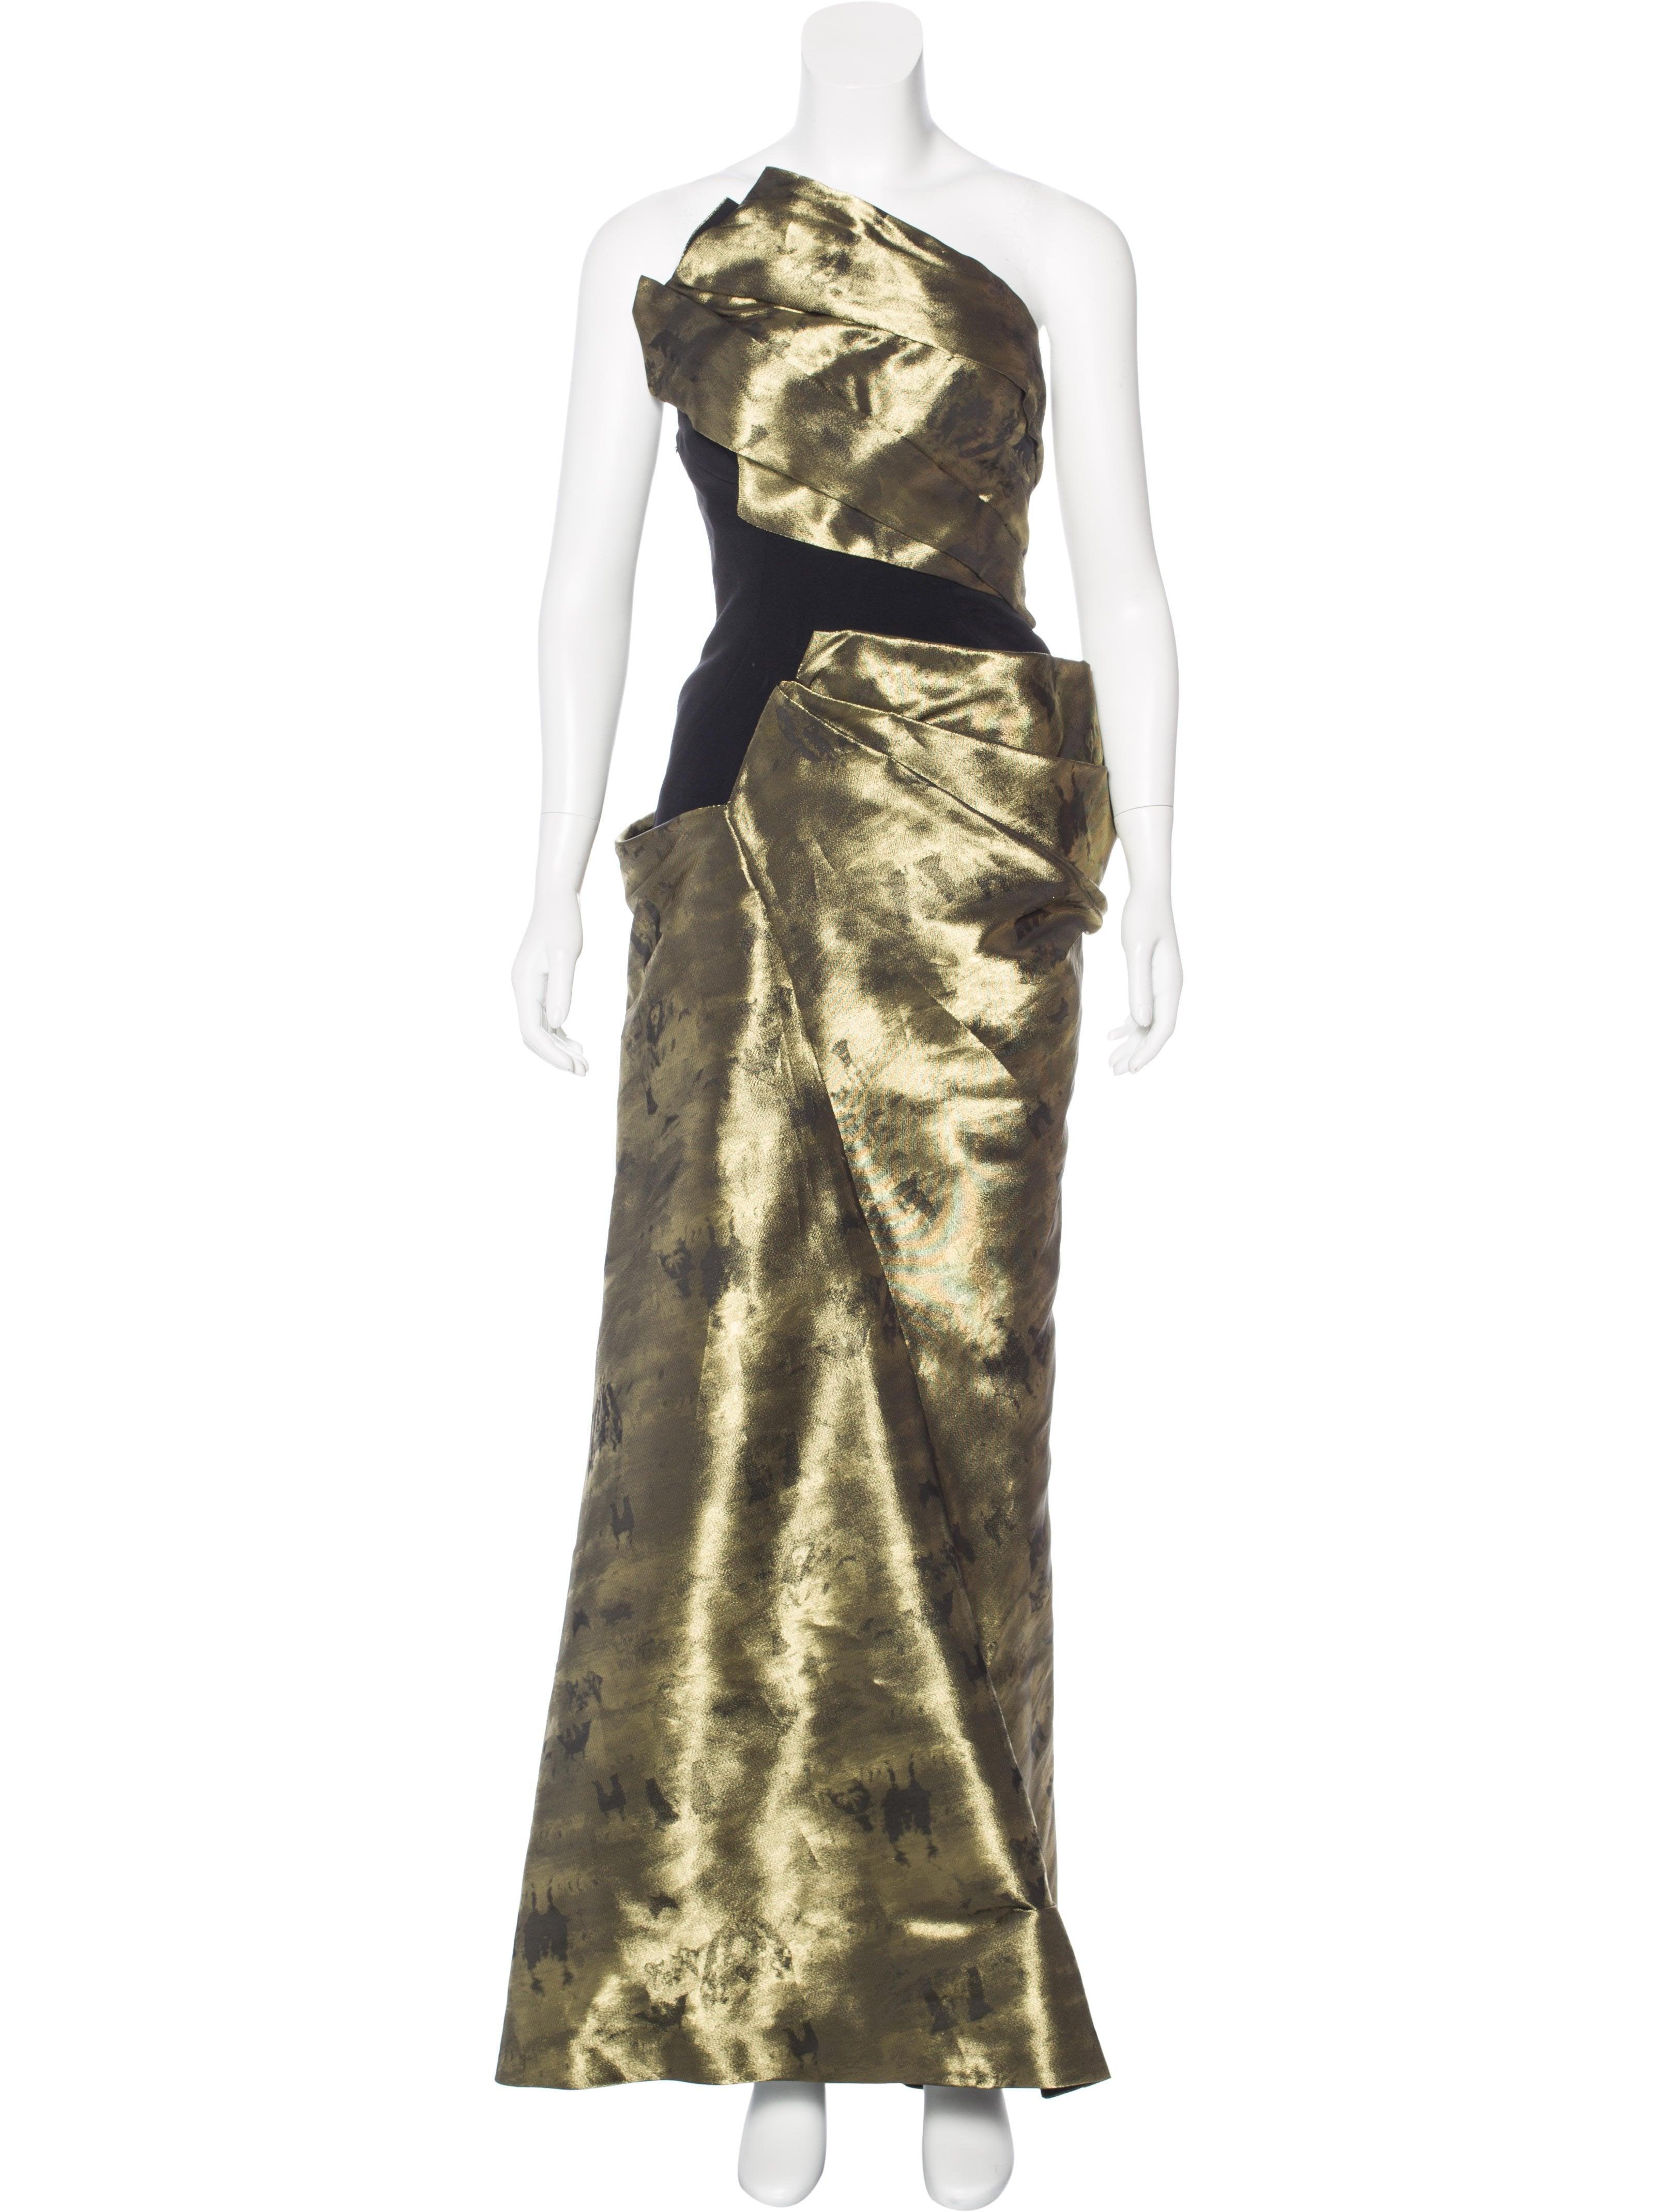 Bibhu Mohapatra Pleated Metallic Gown - Dresses - BIB20186 | The ...